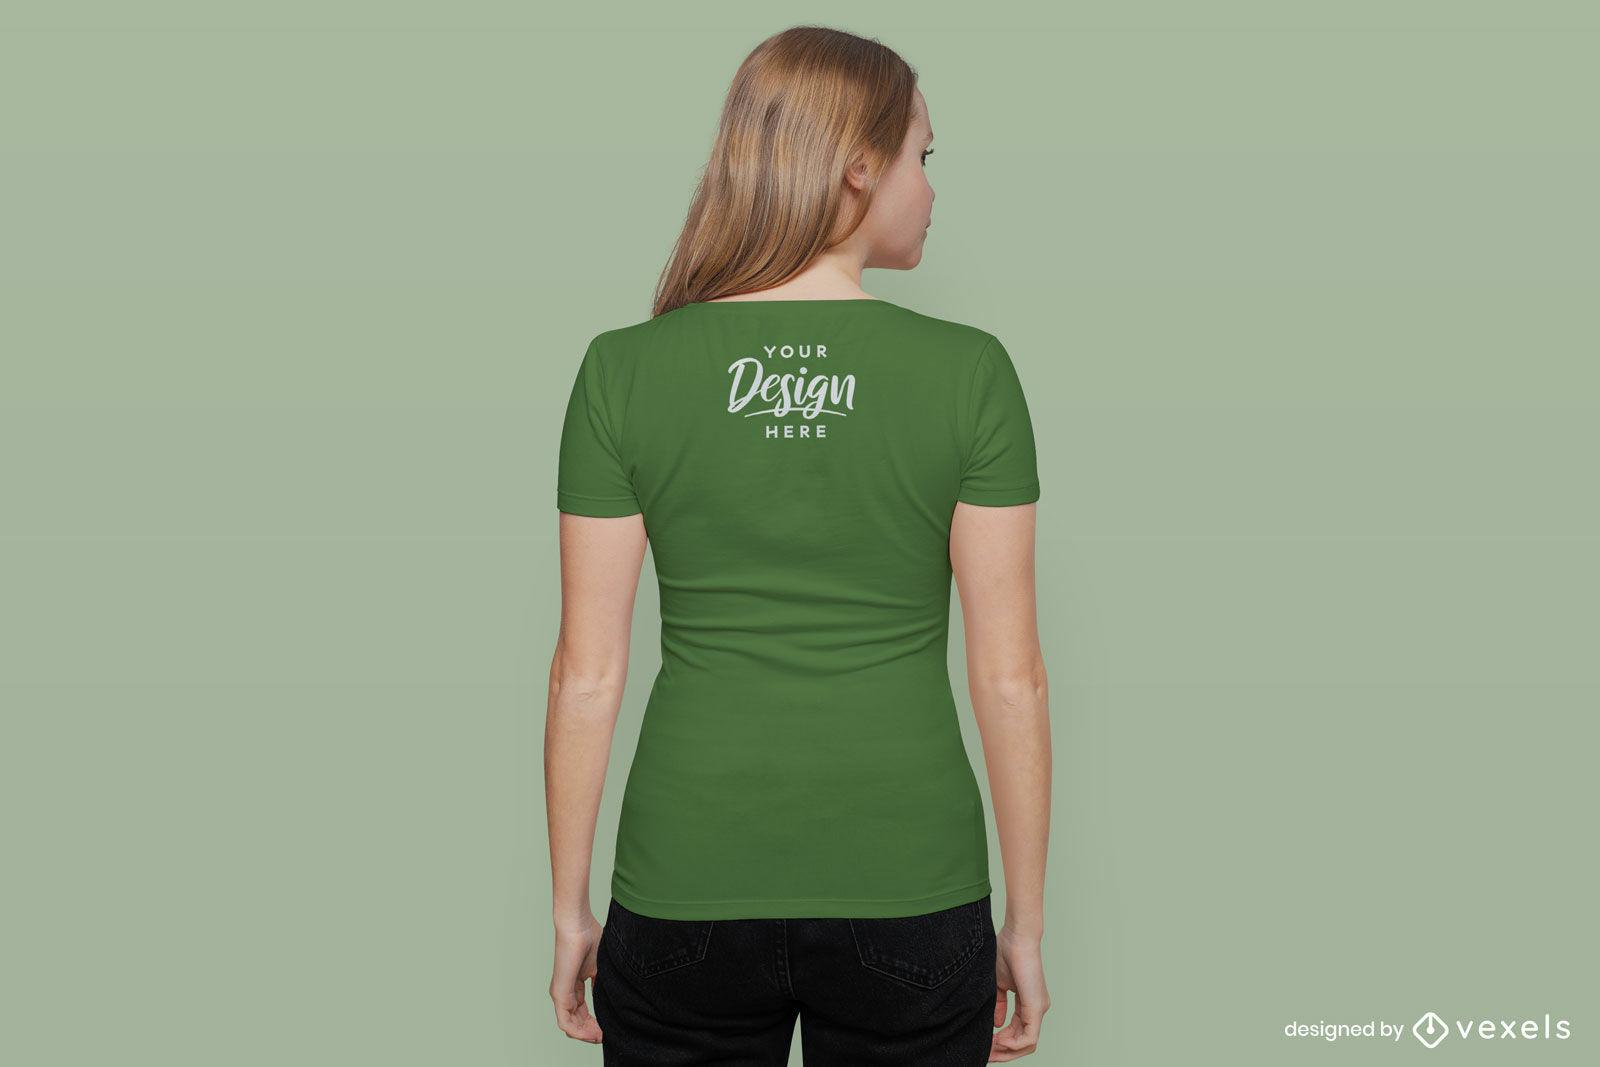 Green t-shirt girl backwards mockup on flat background